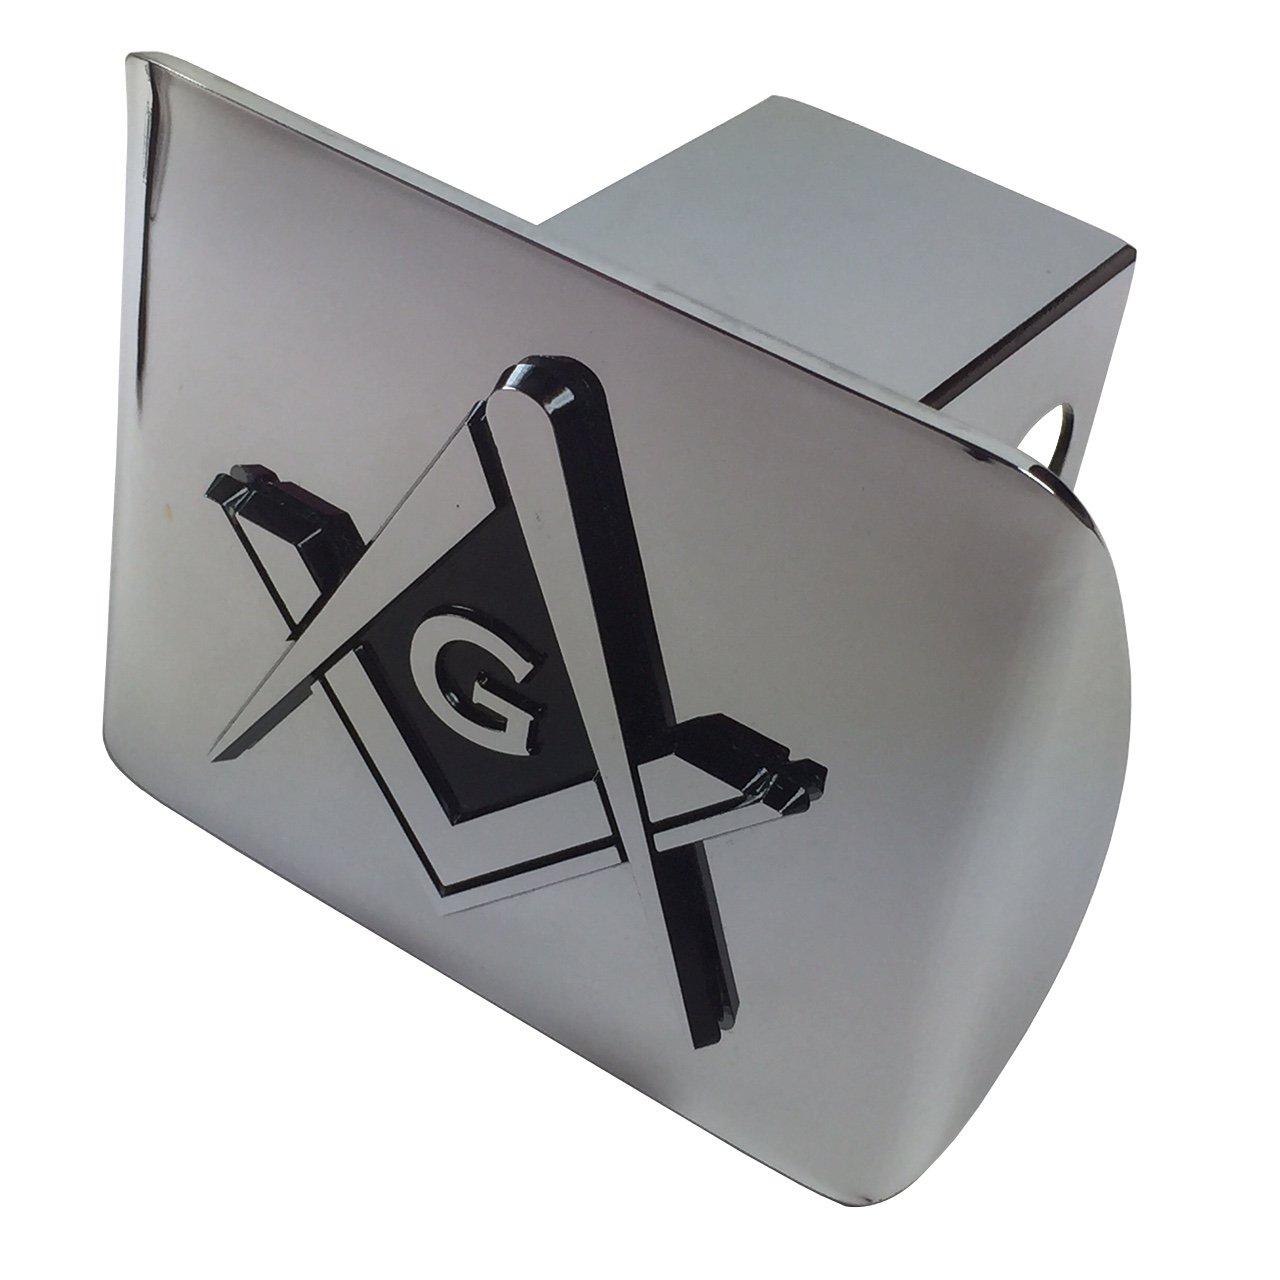 Mason Square Compass Freemason Emblem on Chrome METAL Hitch Cover AMG